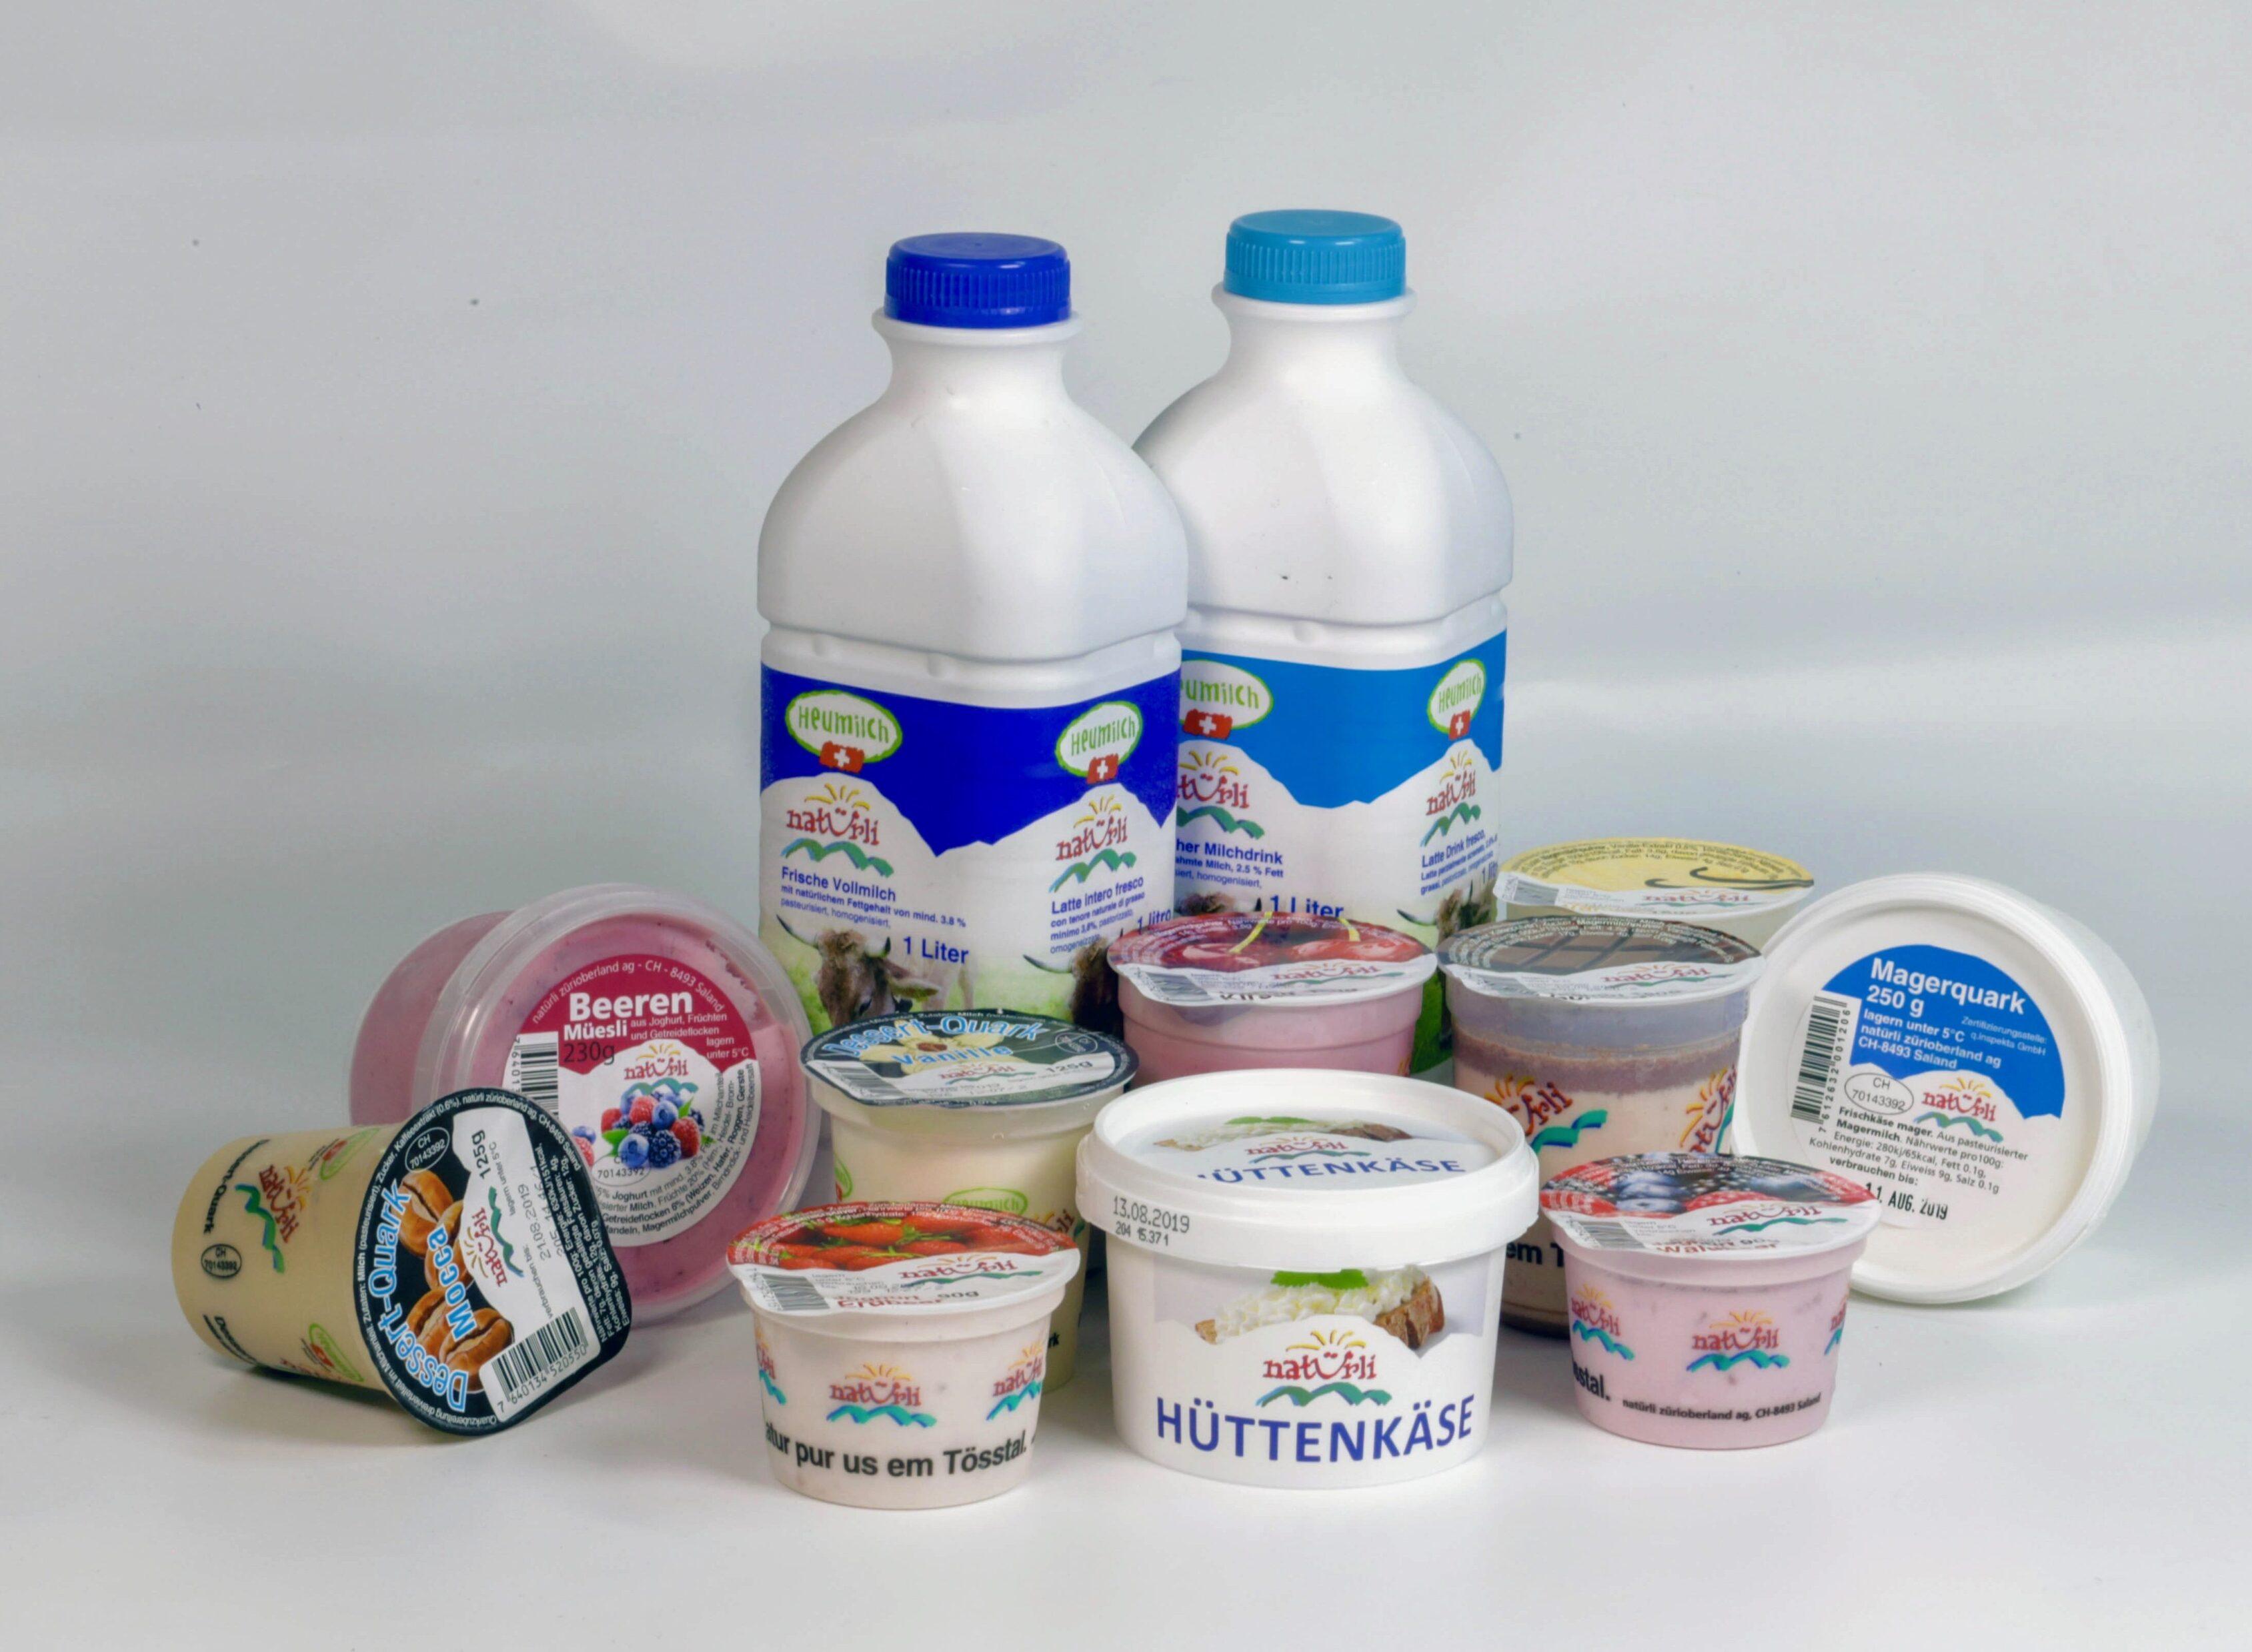 natürli Assortiment de produits laitiers